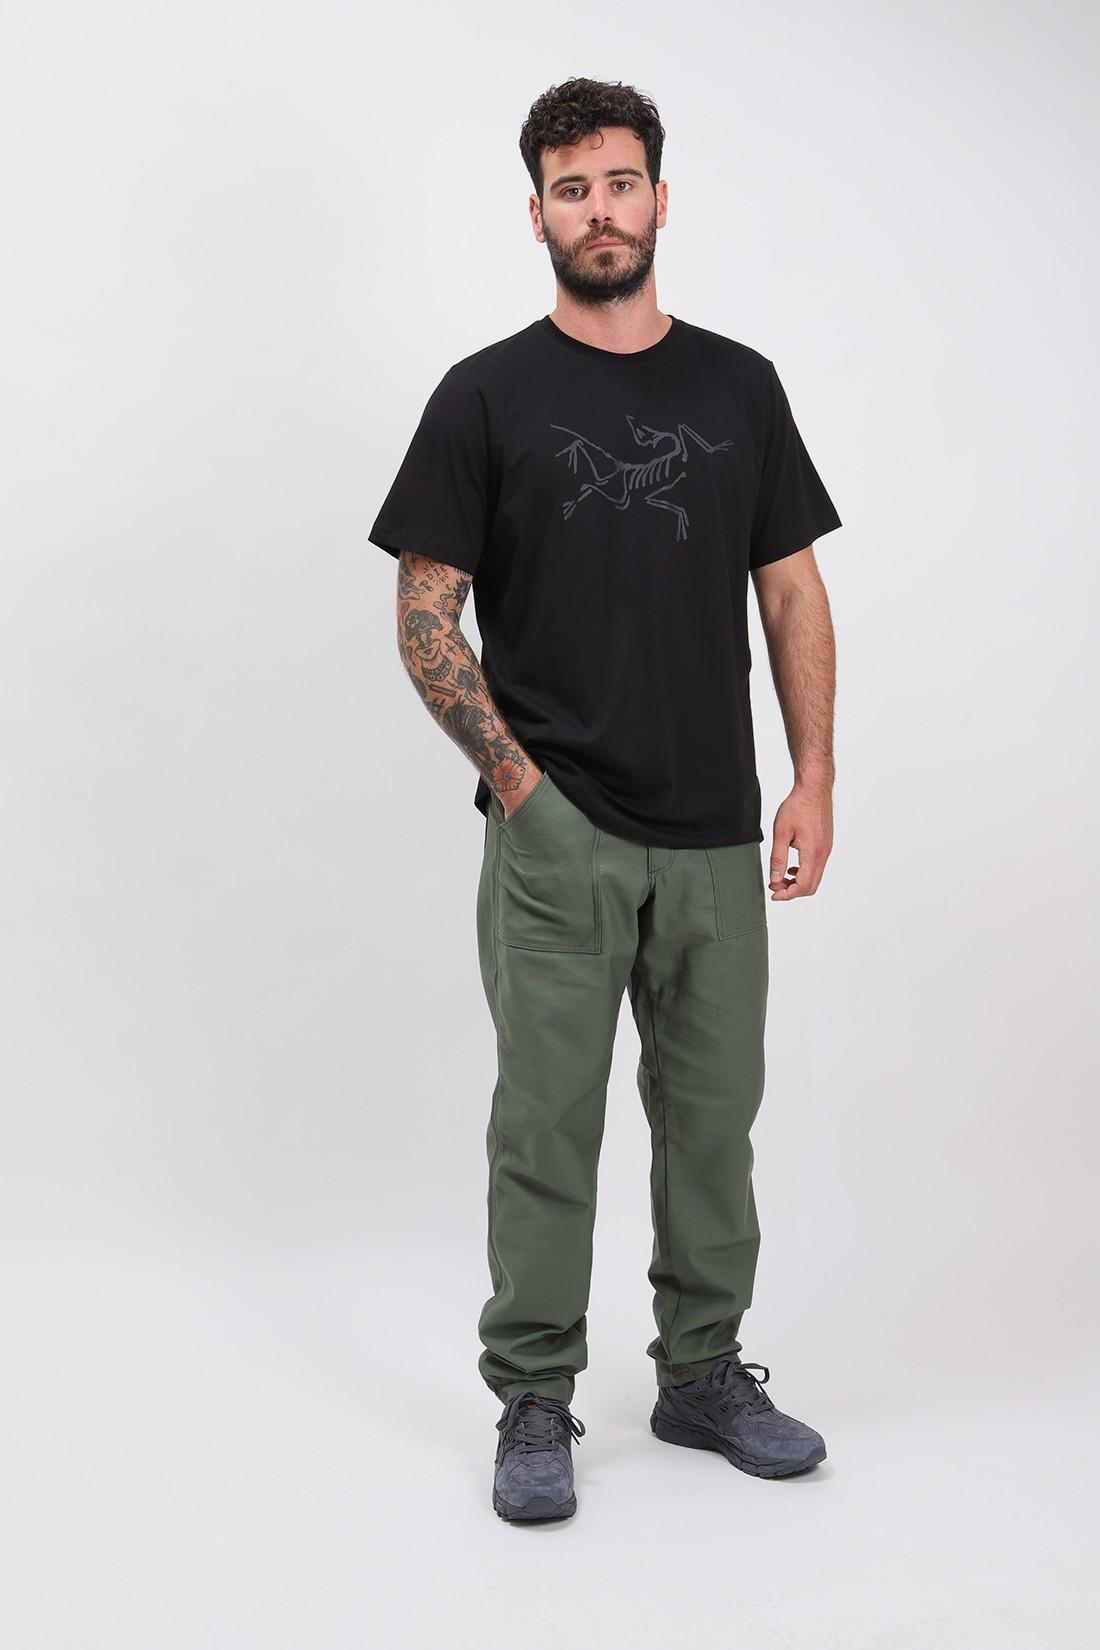 ARC'TERYX / Archaeopteryx tshirt ss mens Black